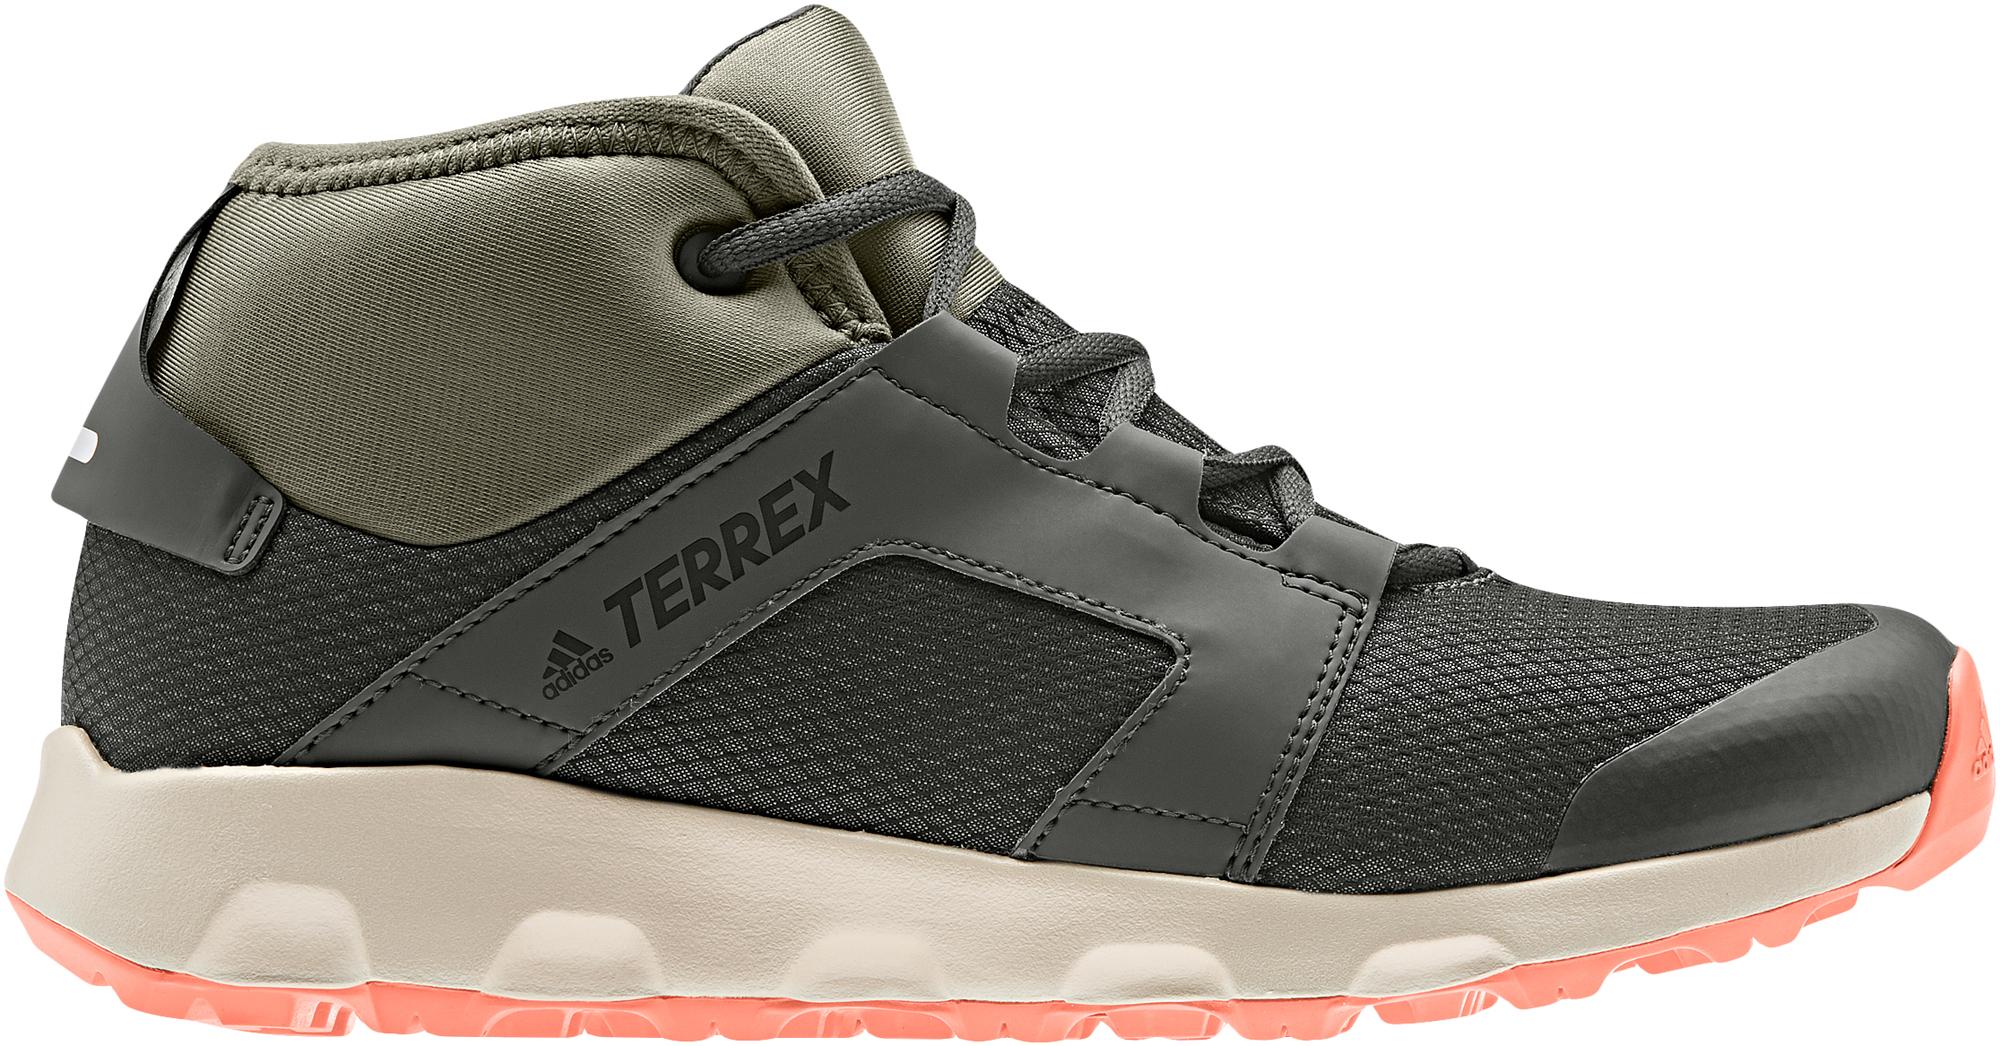 Adidas Ботинки утепленные женские Terrex Voyager, размер 40